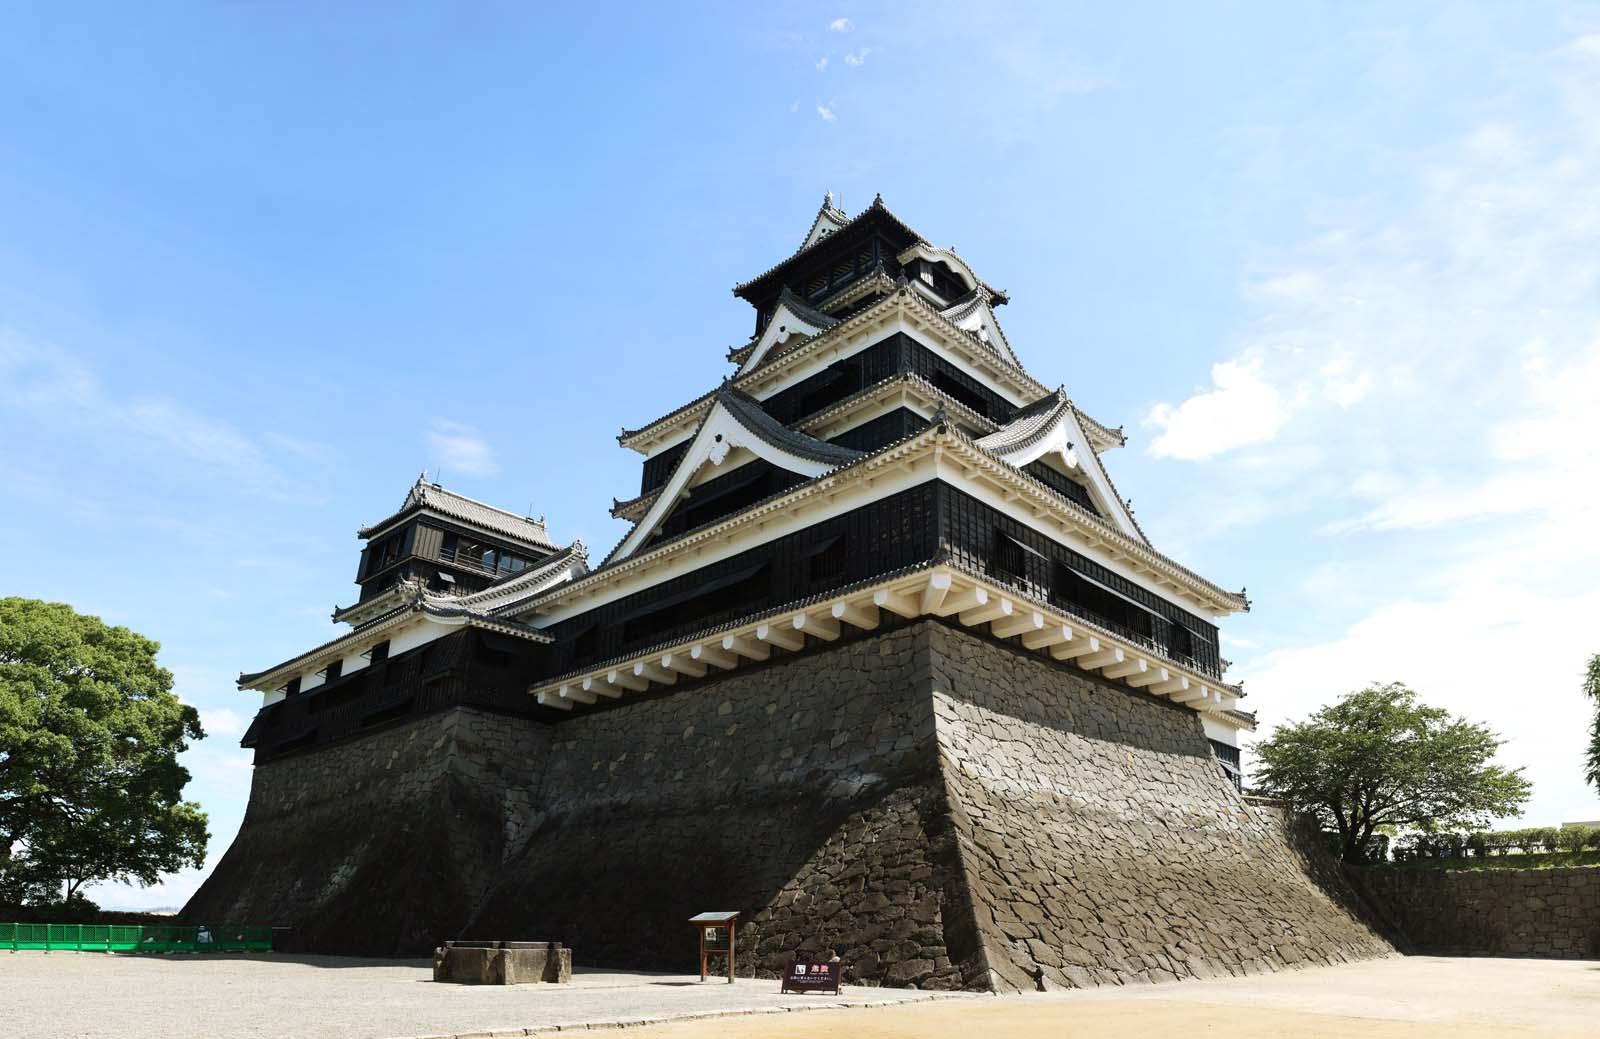 photo,material,free,landscape,picture,stock photo,Creative Commons,Kumamoto-jo Castle, Ginkgo Castle, The Southwestern Rebellion, One castle tower, bridge Kuo-type castle on a hill